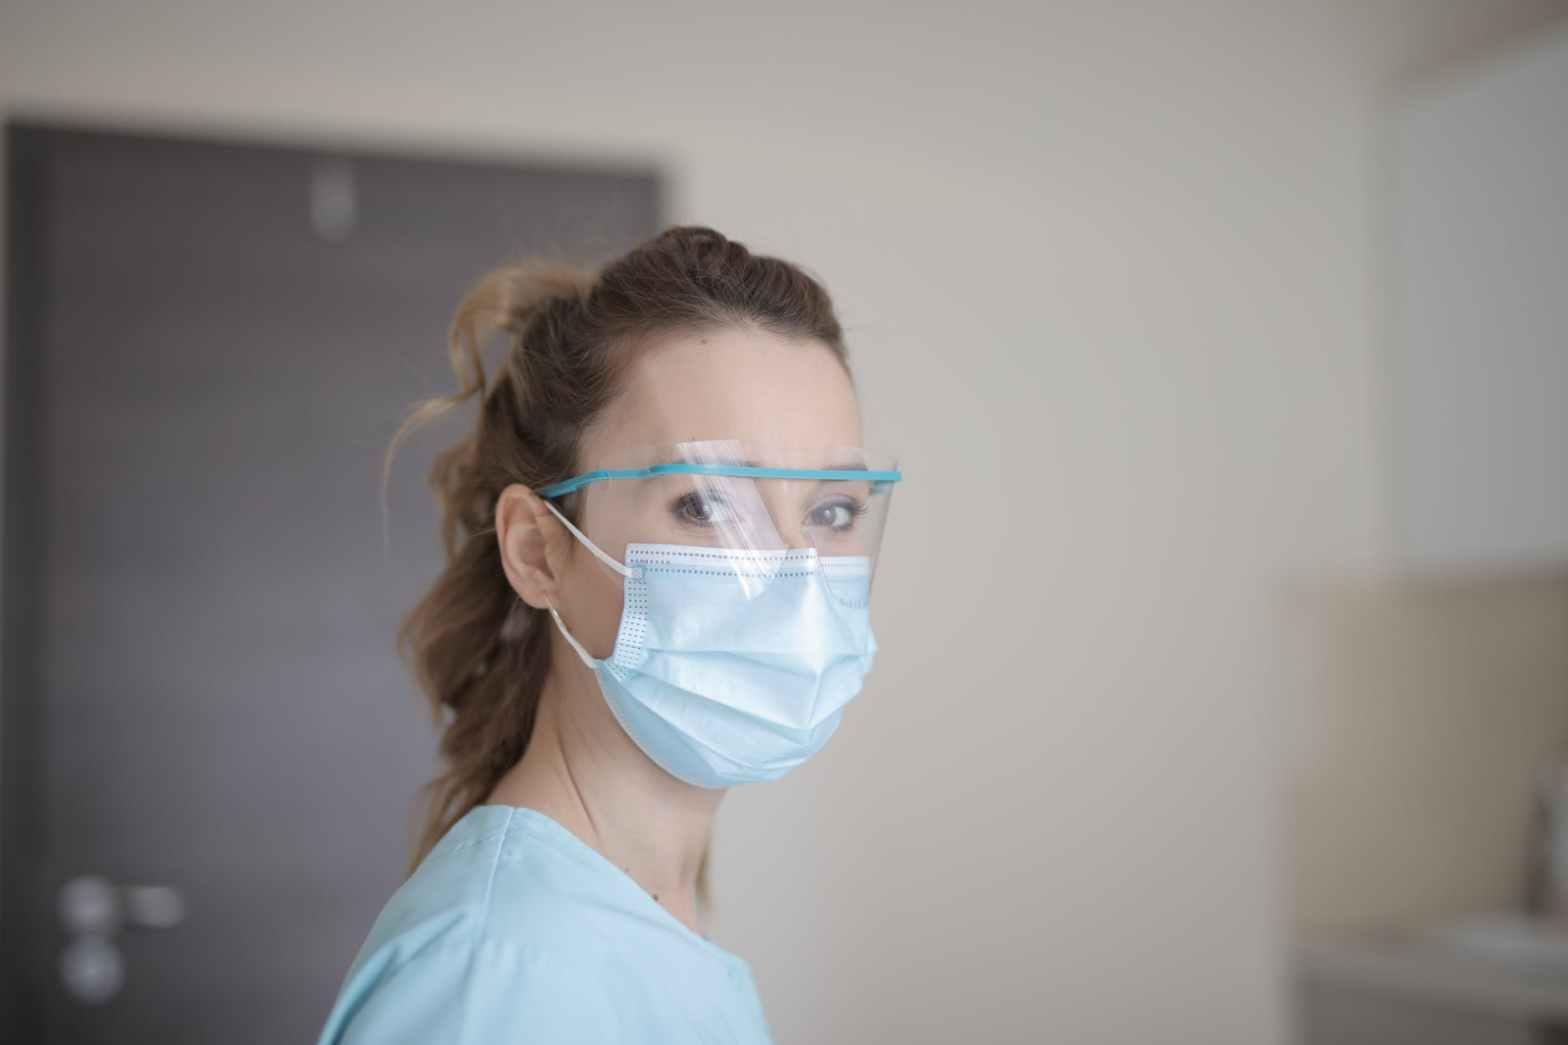 woman in blue shirt wearing face mask